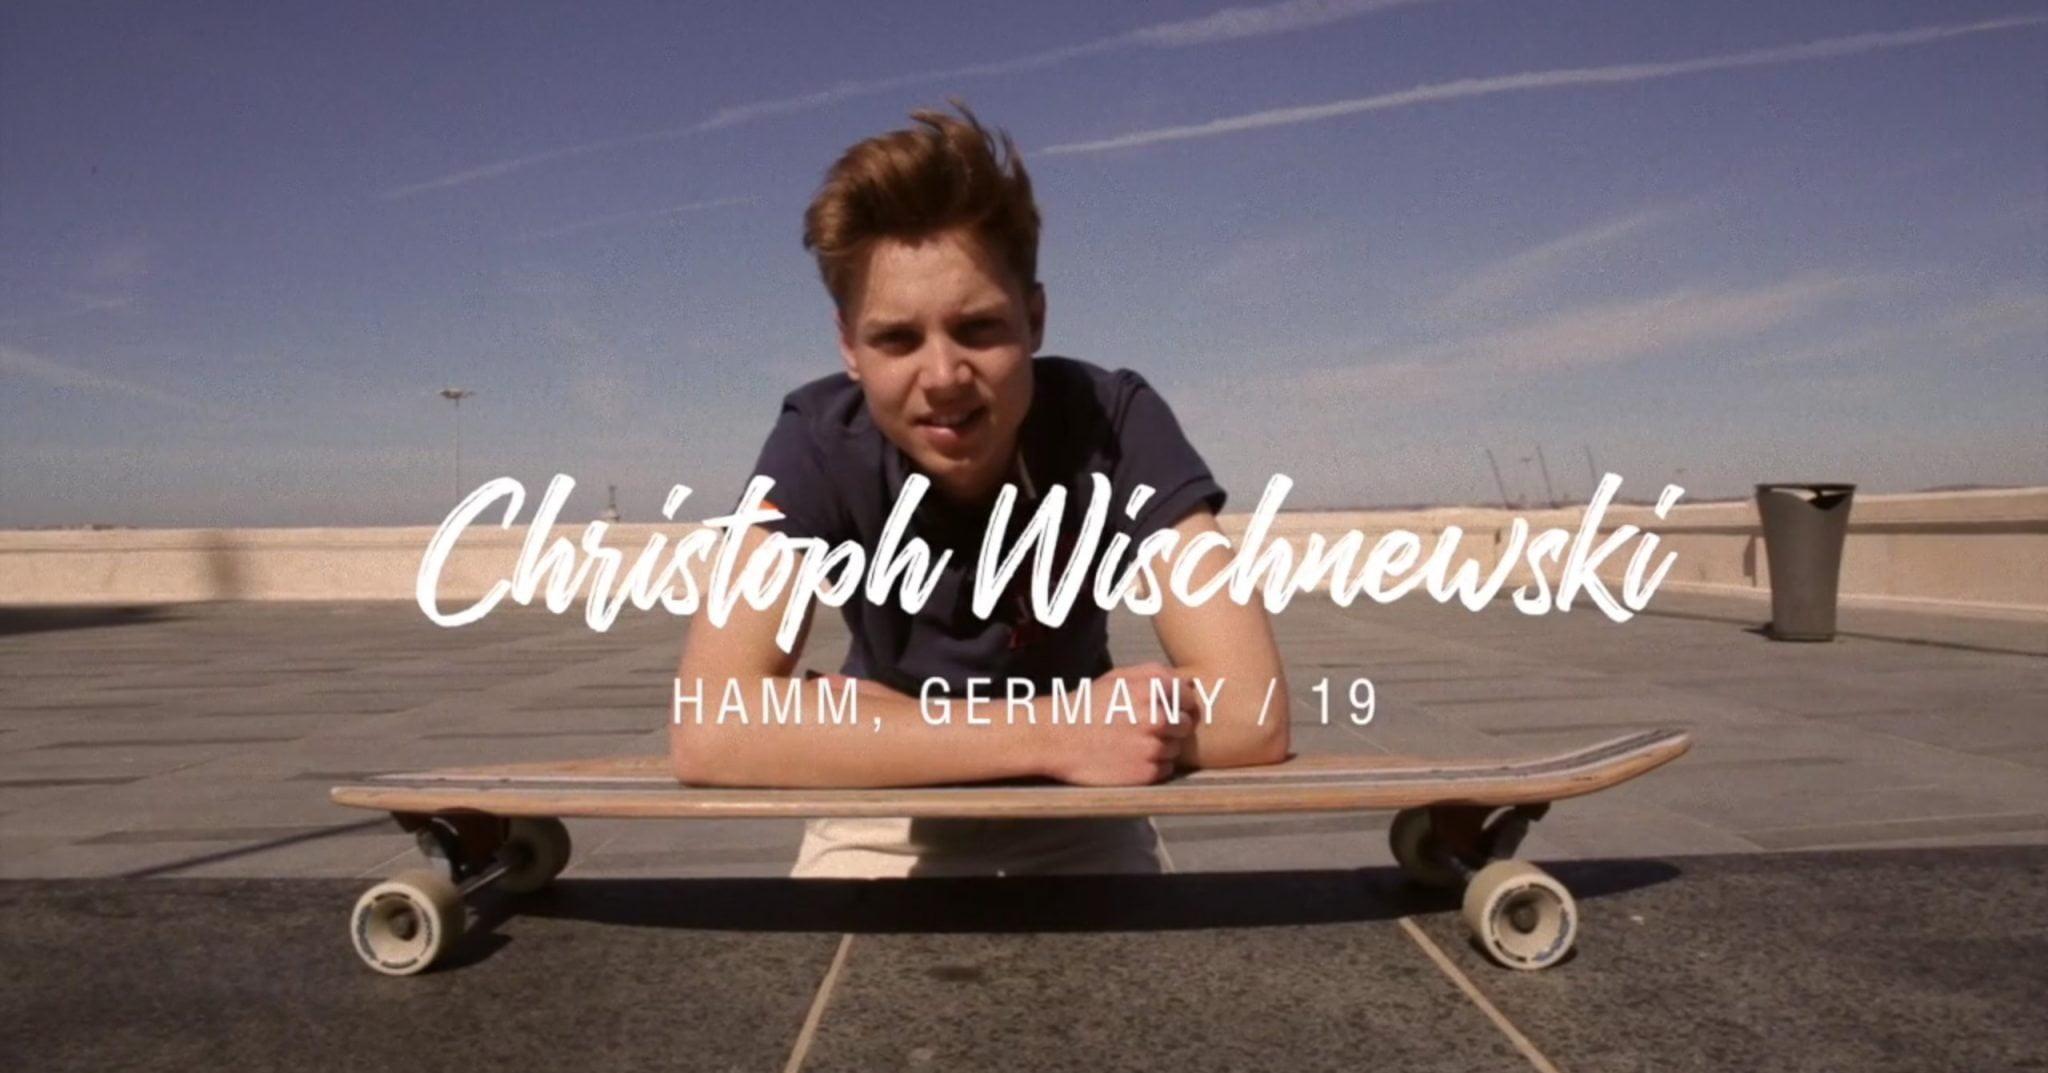 Video Testimony: Christoph